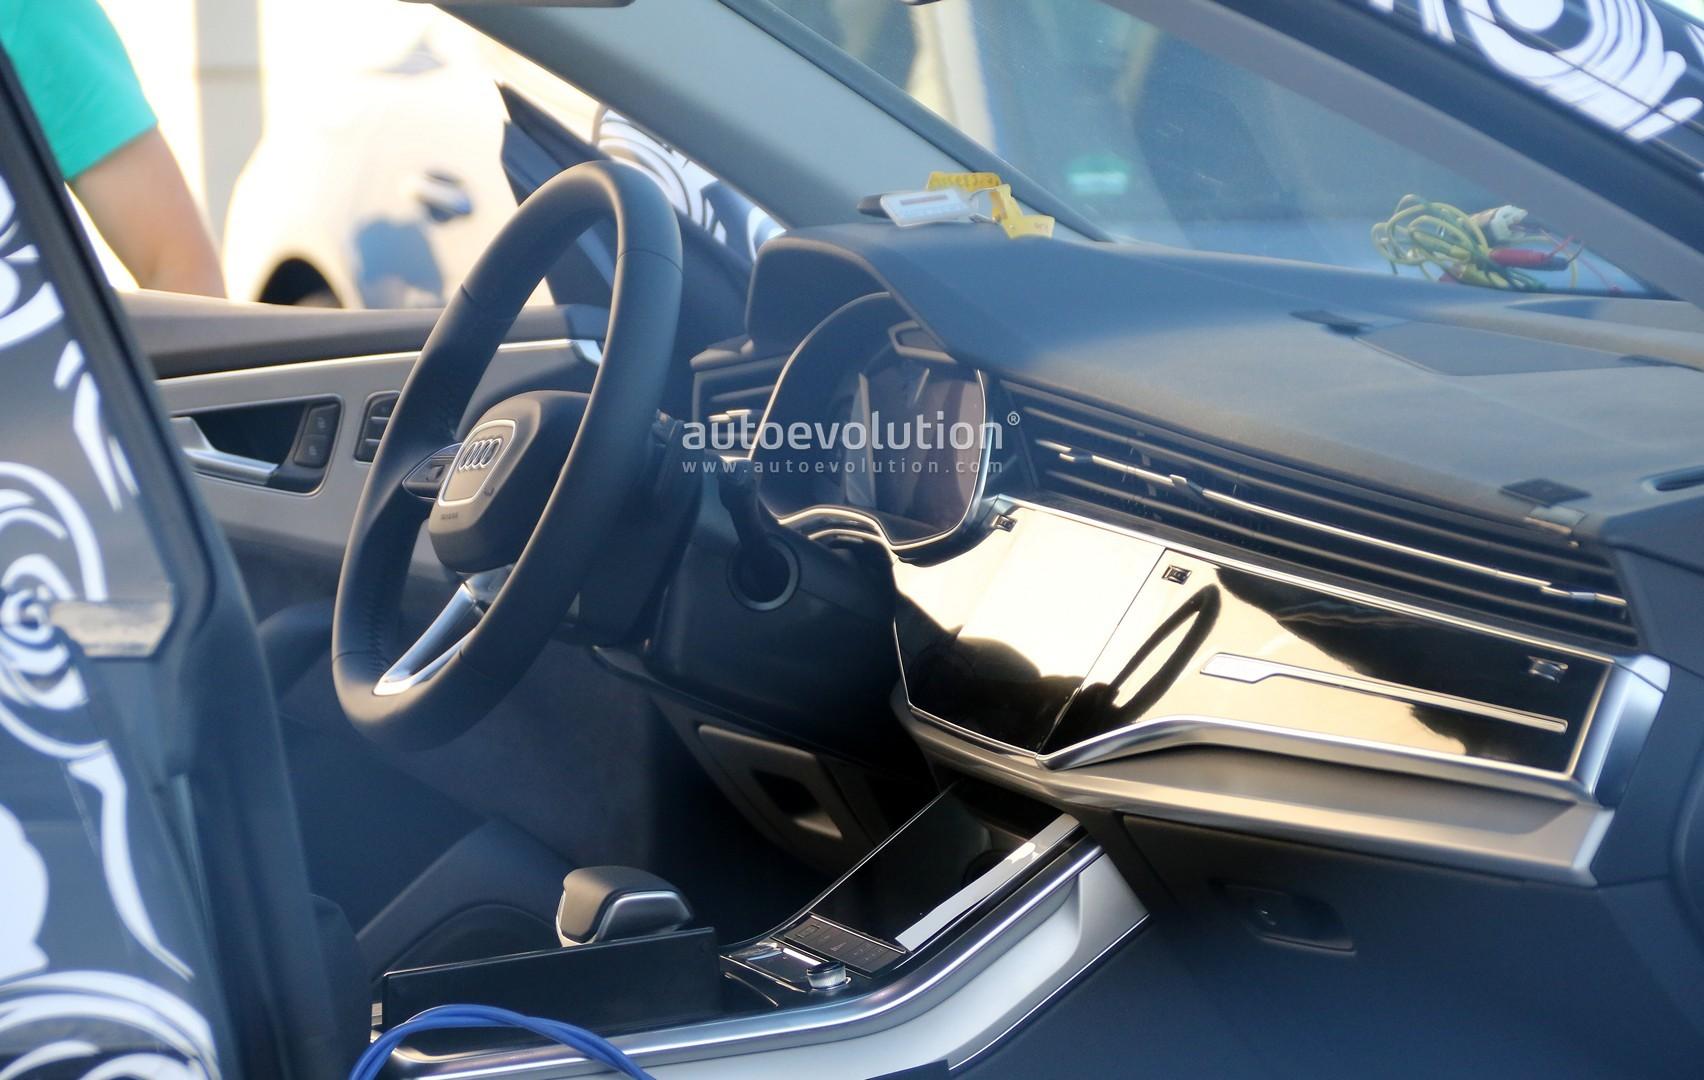 2019-audi-q8-revealed-by-production-ready-prototype-has-urus-like-rear-end_10.jpg